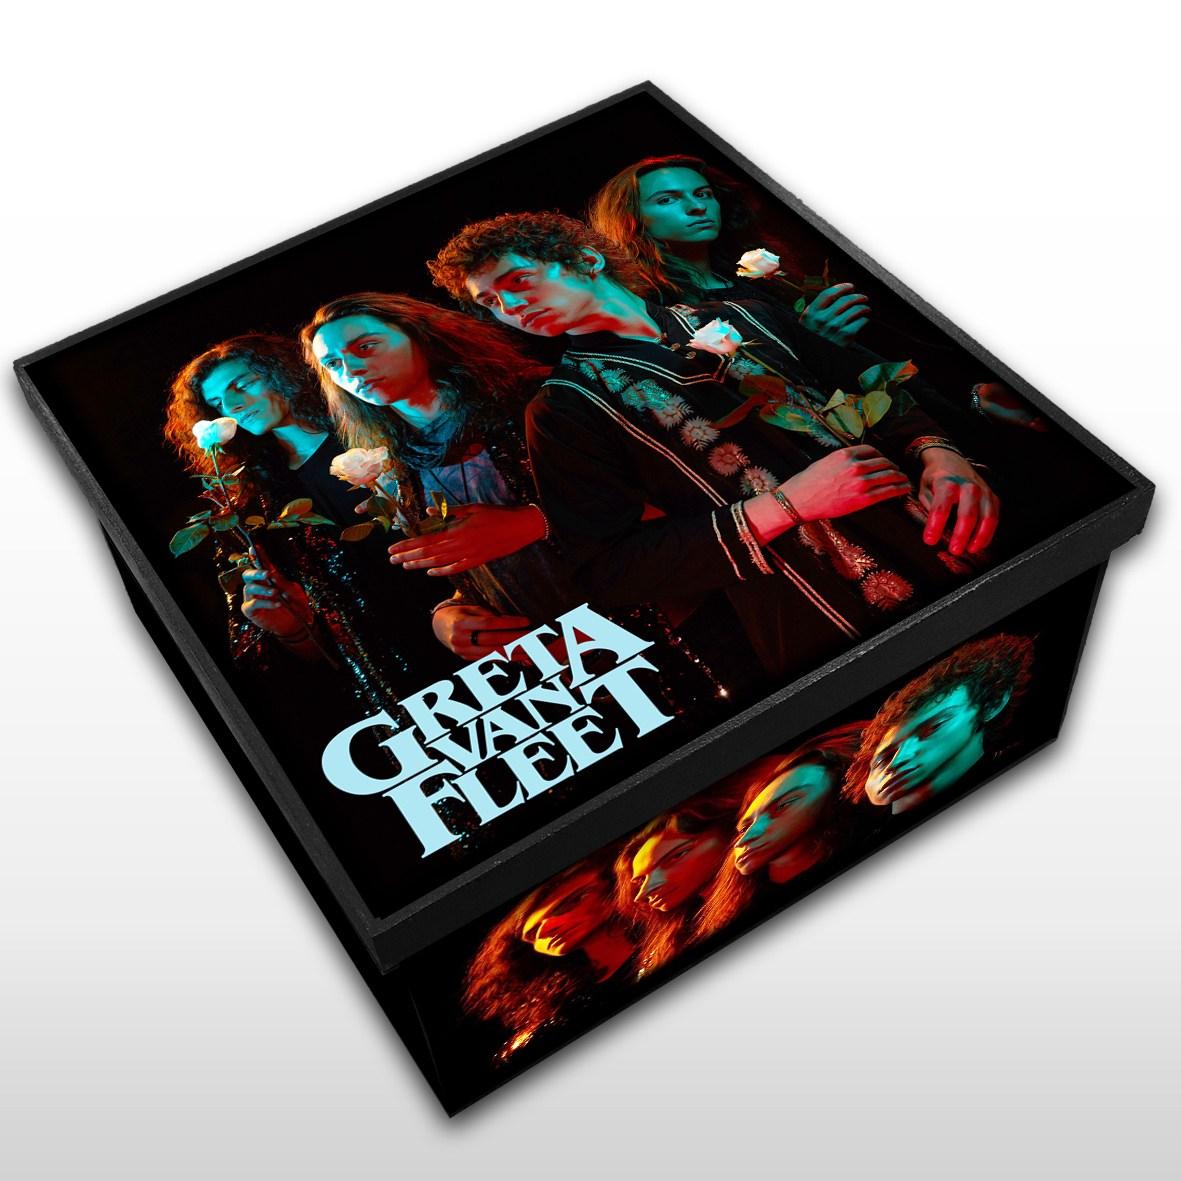 Greta Van Fleet - Caixa Organizadora em Madeira MDF - Tamanho Médio - Mr. Rock